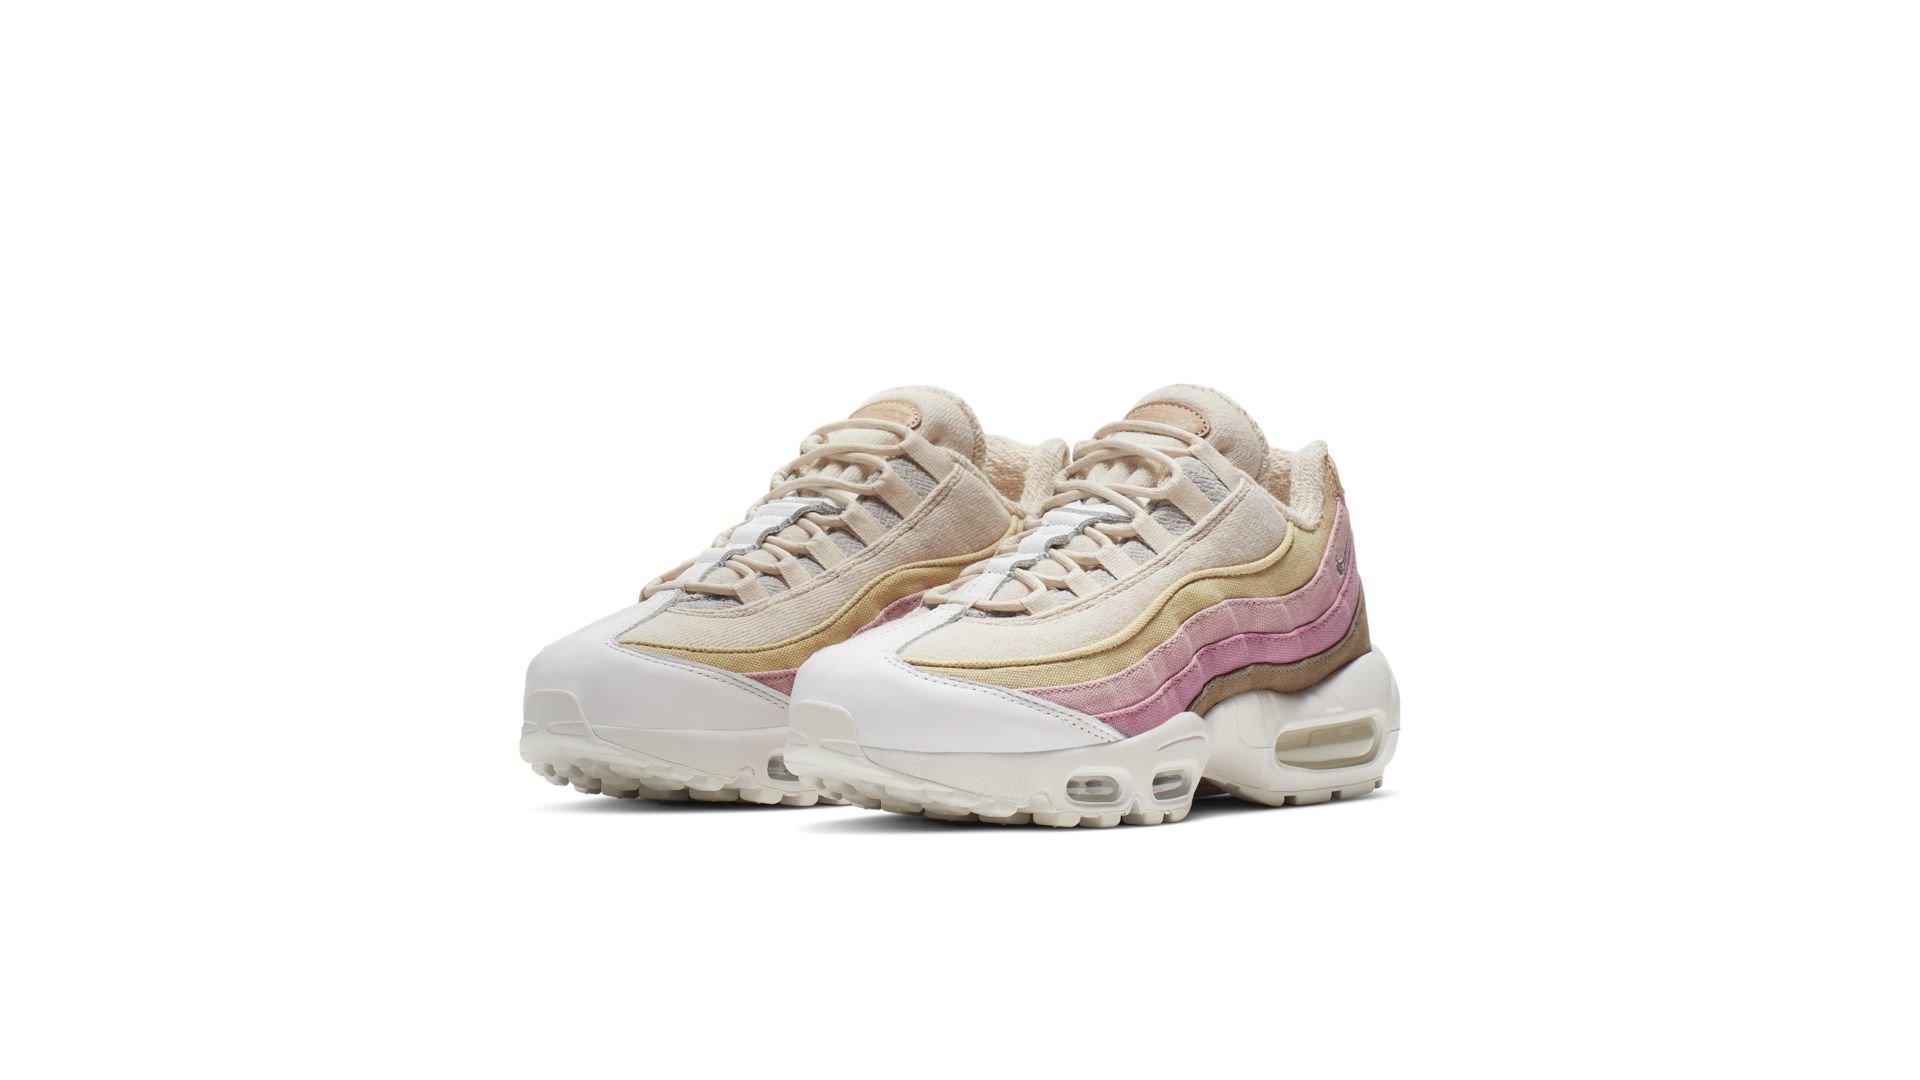 Nike Air Max 95 Plant Color 'Pink' (CD7142-700)